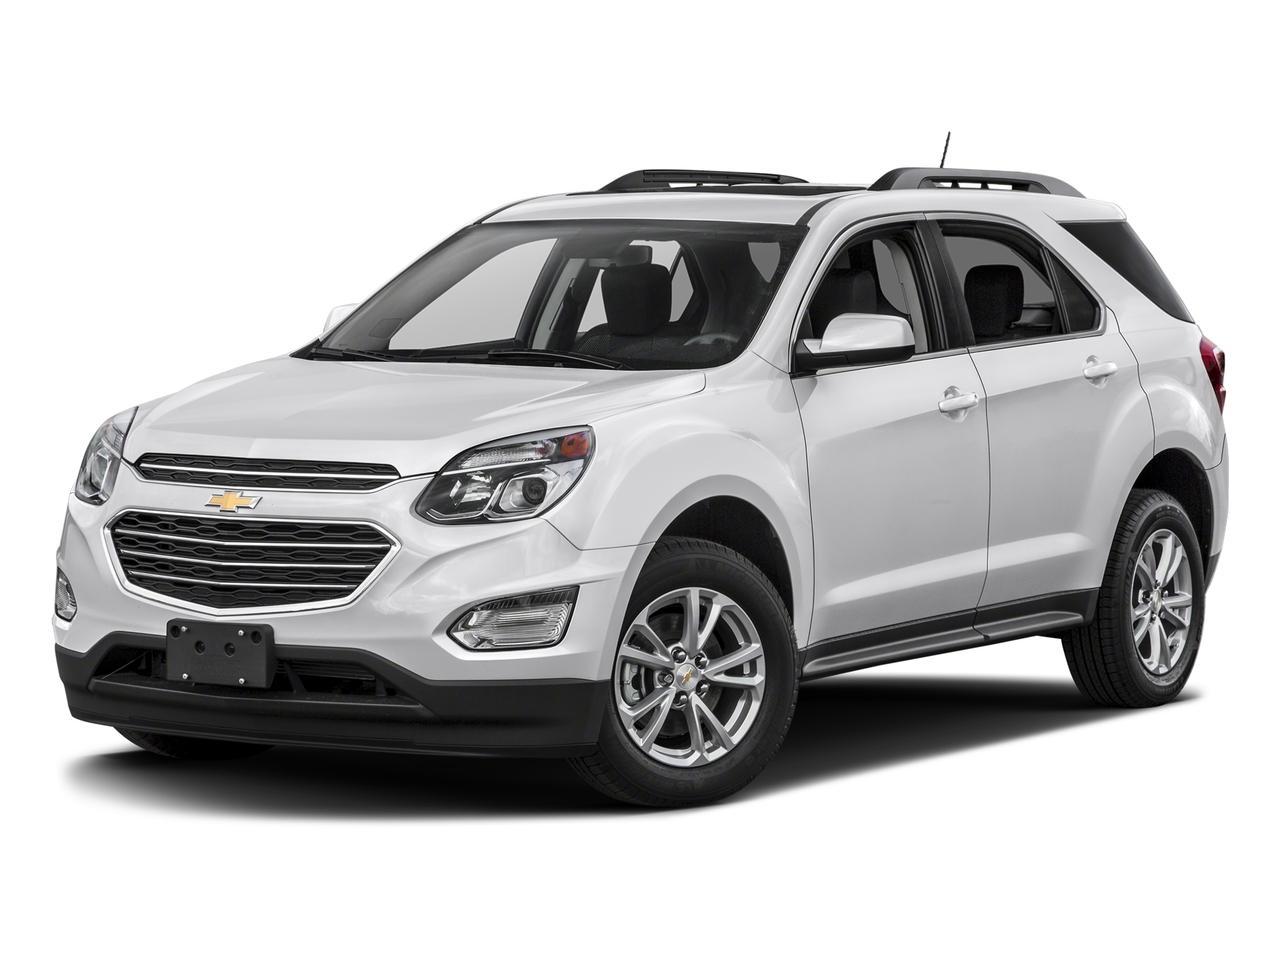 2017 Chevrolet Equinox Vehicle Photo in Helena, MT 59601